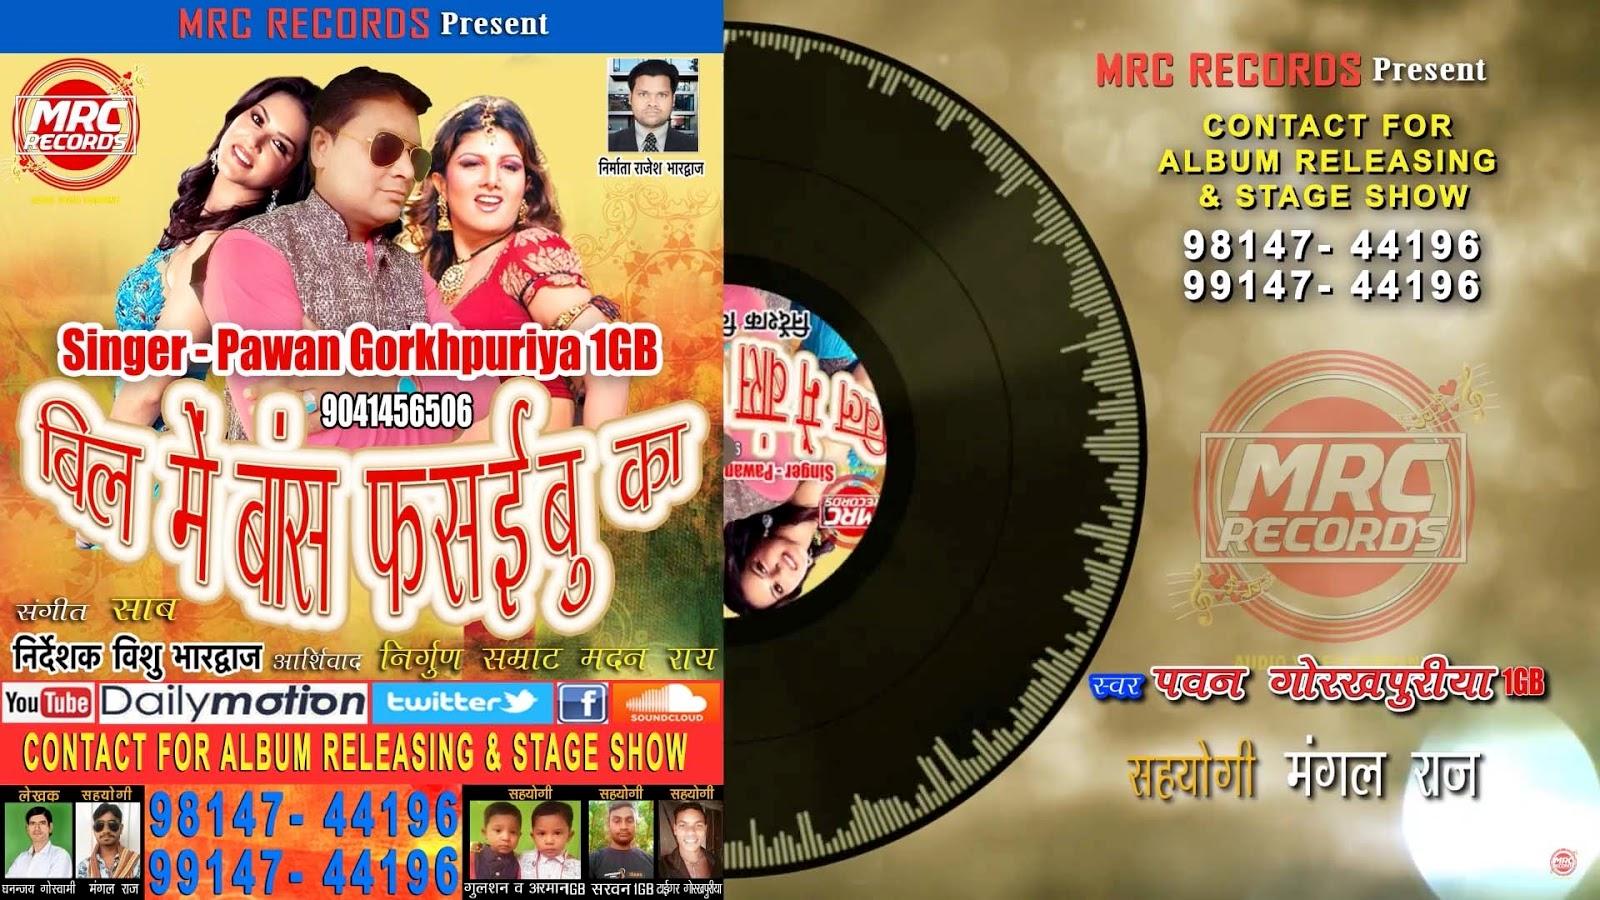 Electronic bhojpuri video song gana dj karua tel